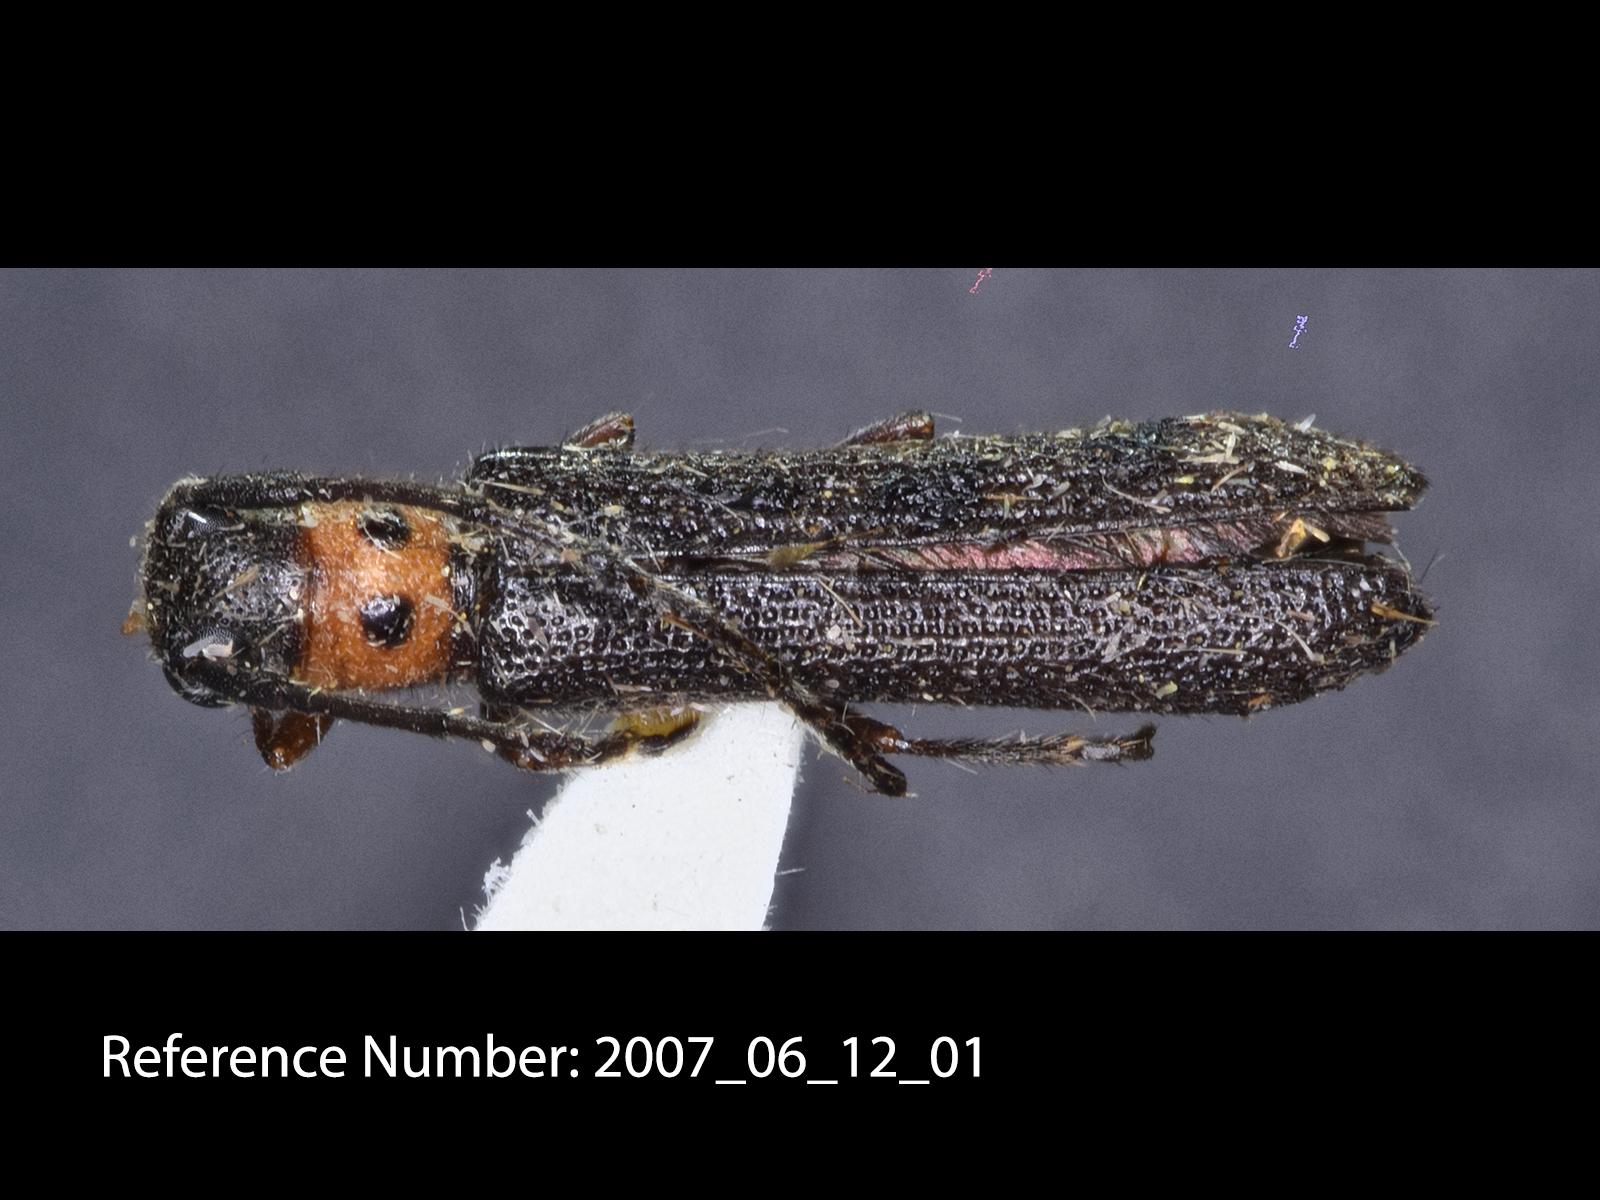 Oberea pruinosa dorsal view